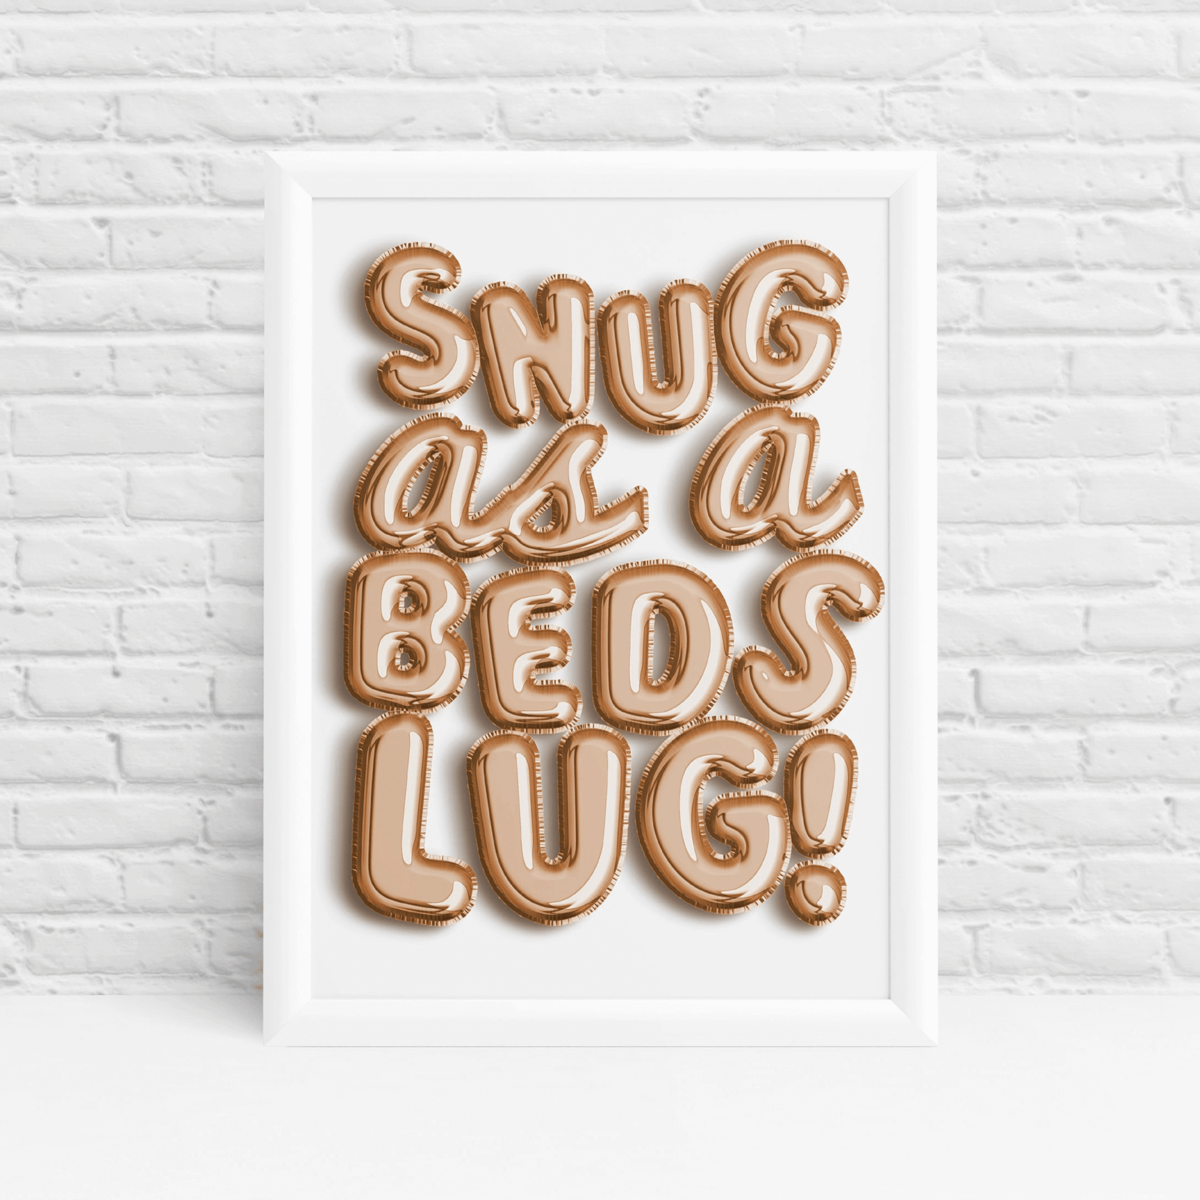 Helium balloon print ideal dorm wall art and bedroom decor by Ibbleobble®